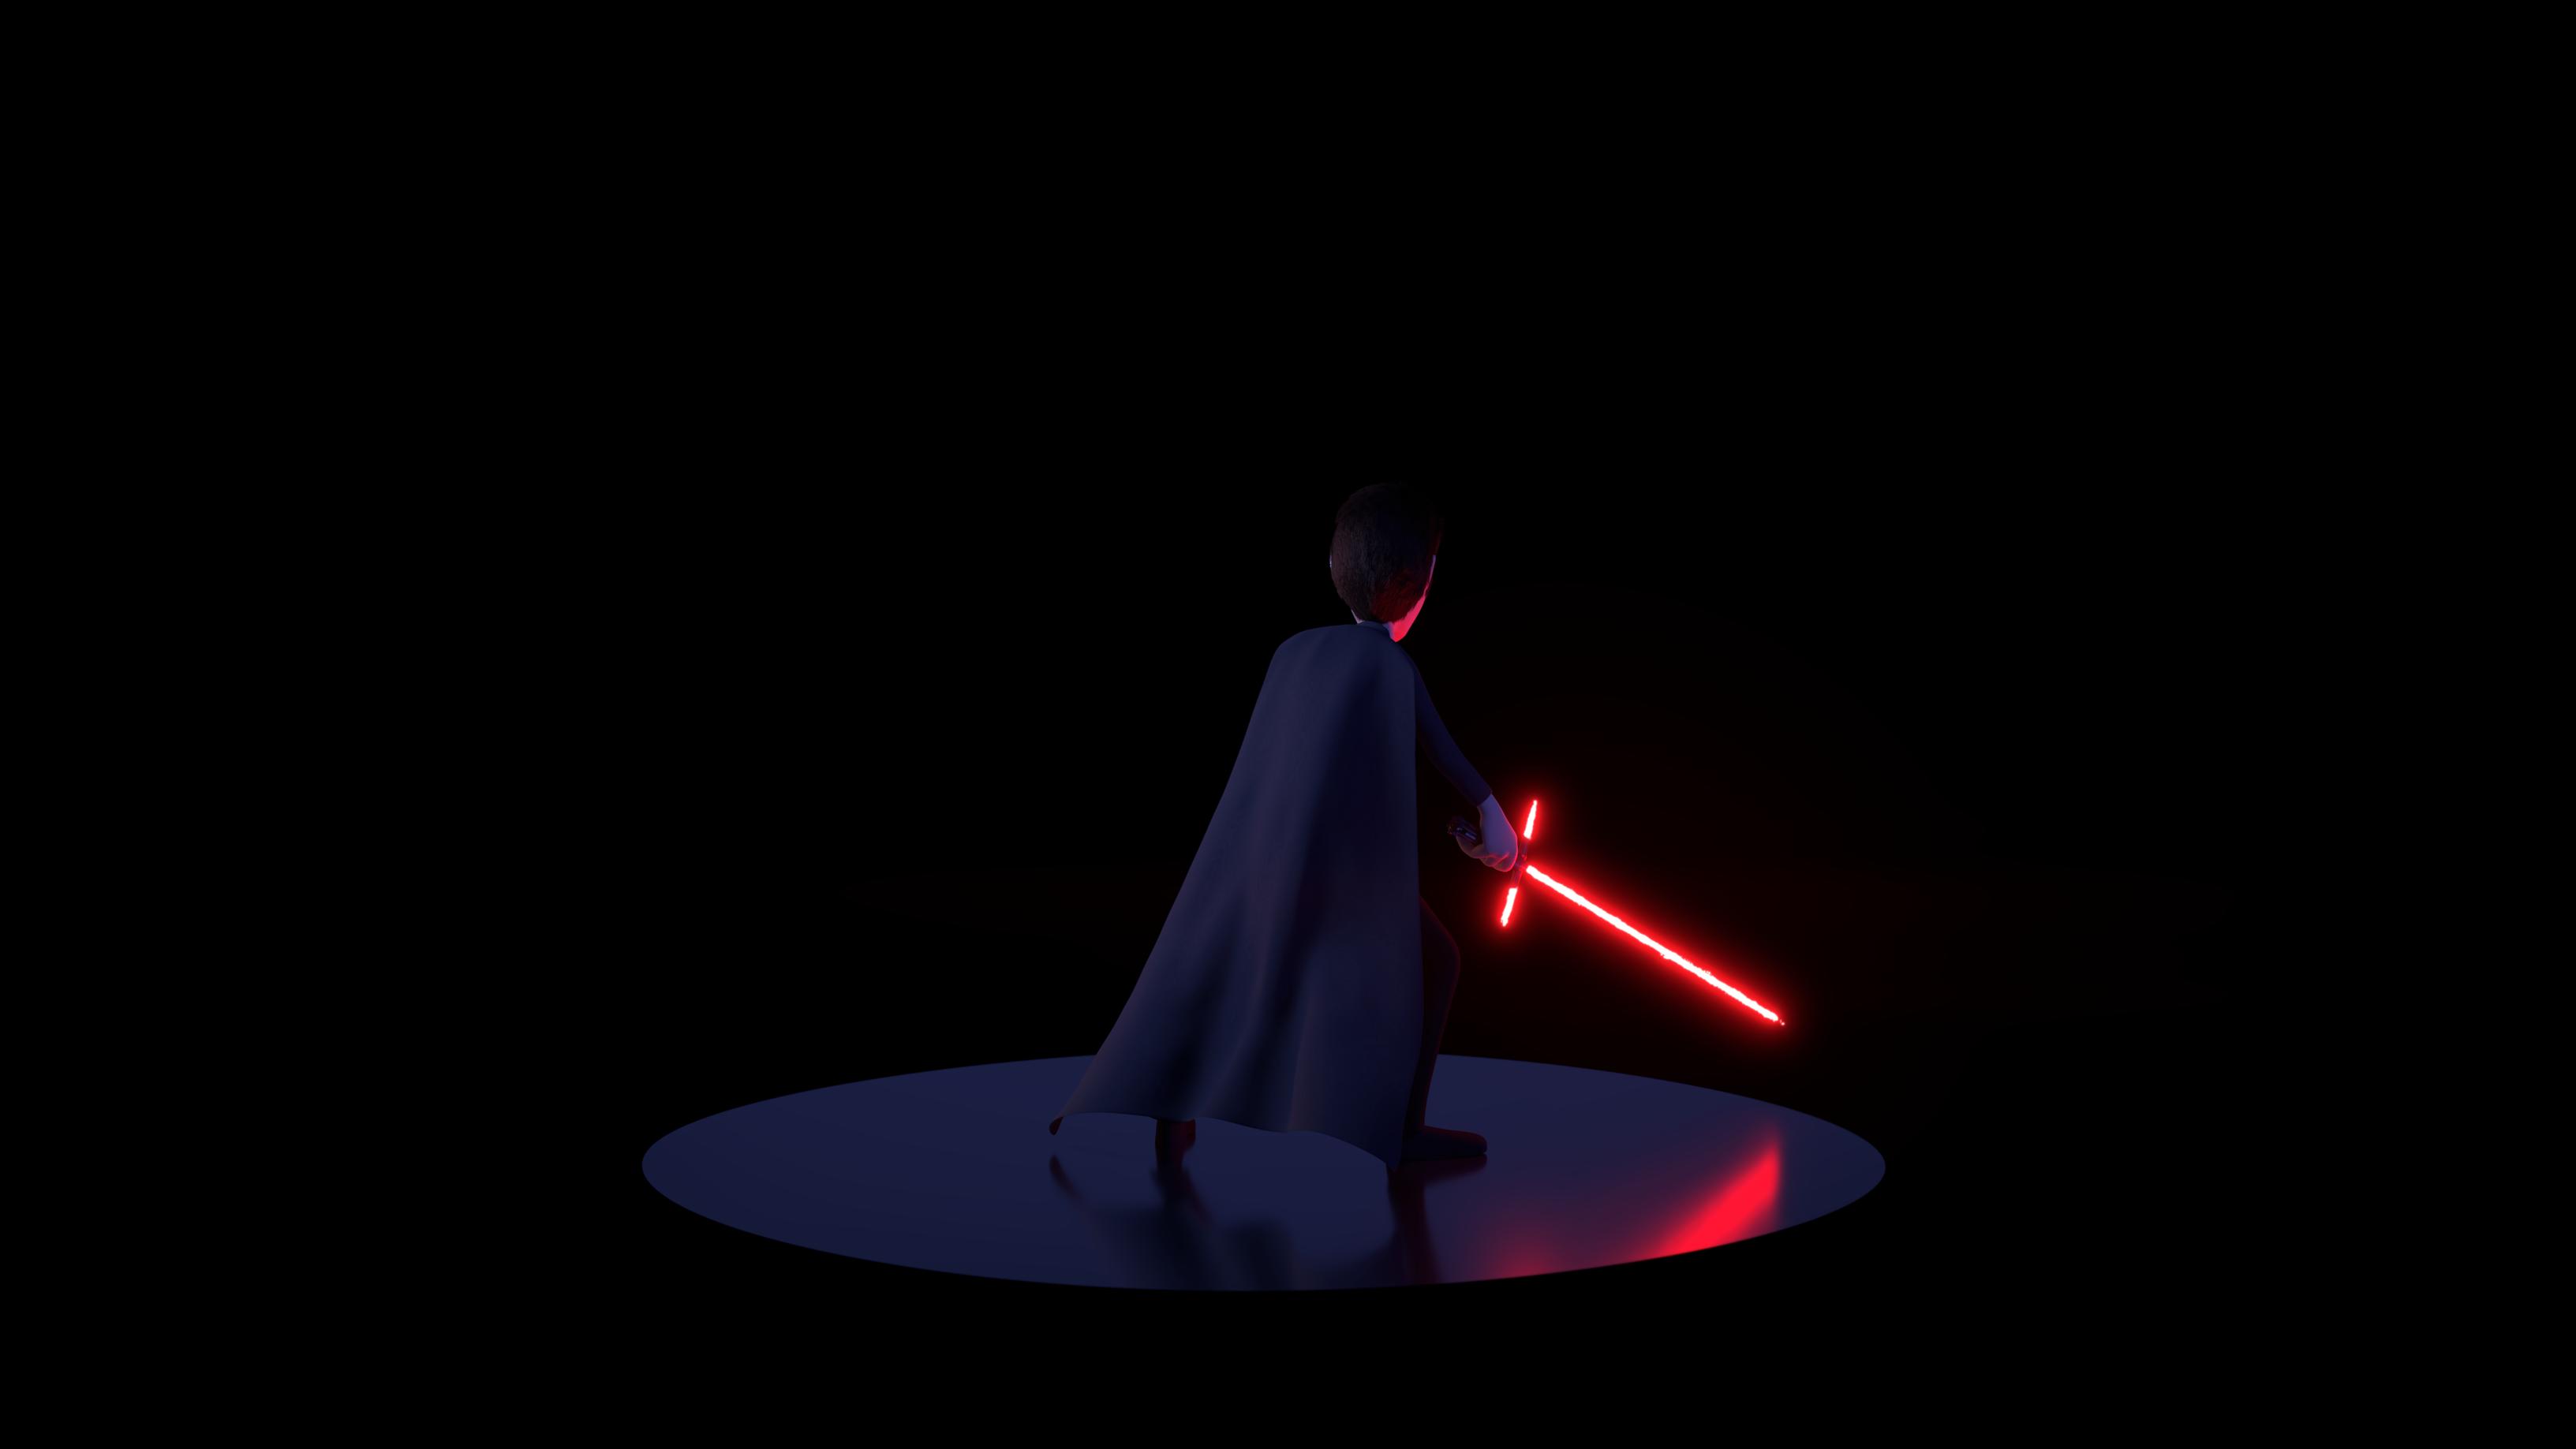 The Dark Side by Dulana57